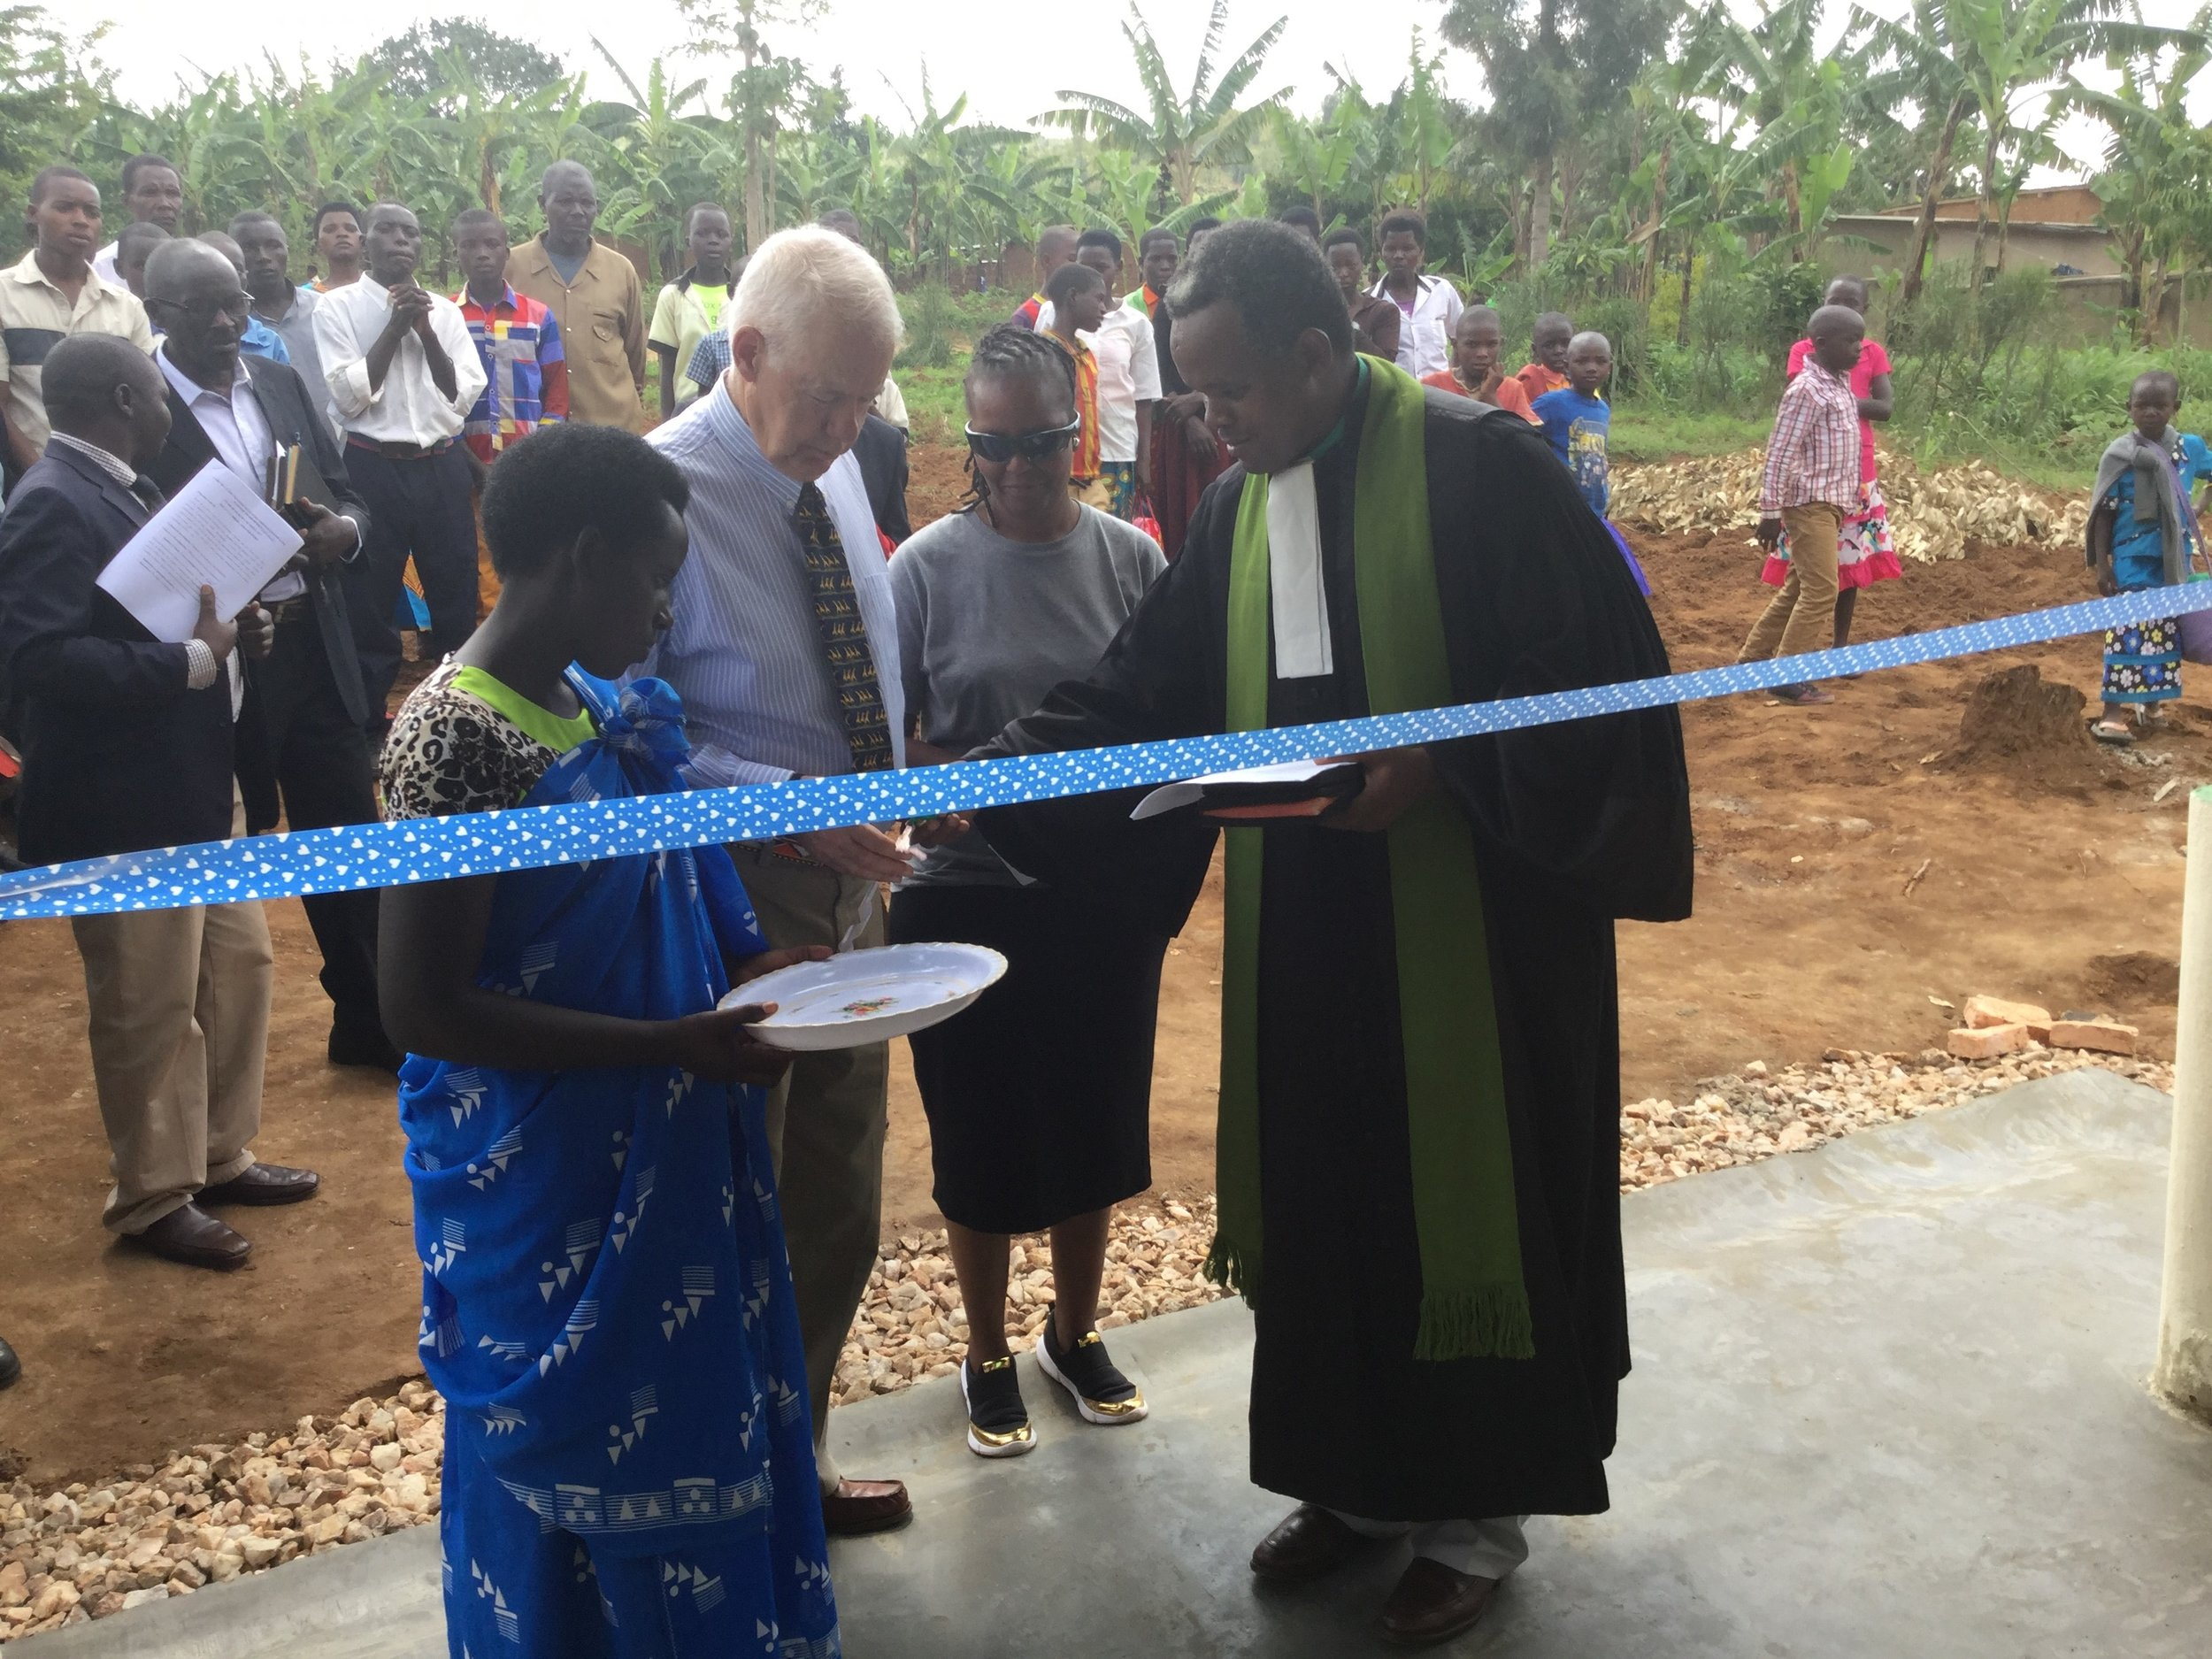 Rwanda-Church-Construction-October-2017-update-pastor-Stu-Nyabubare.jpg